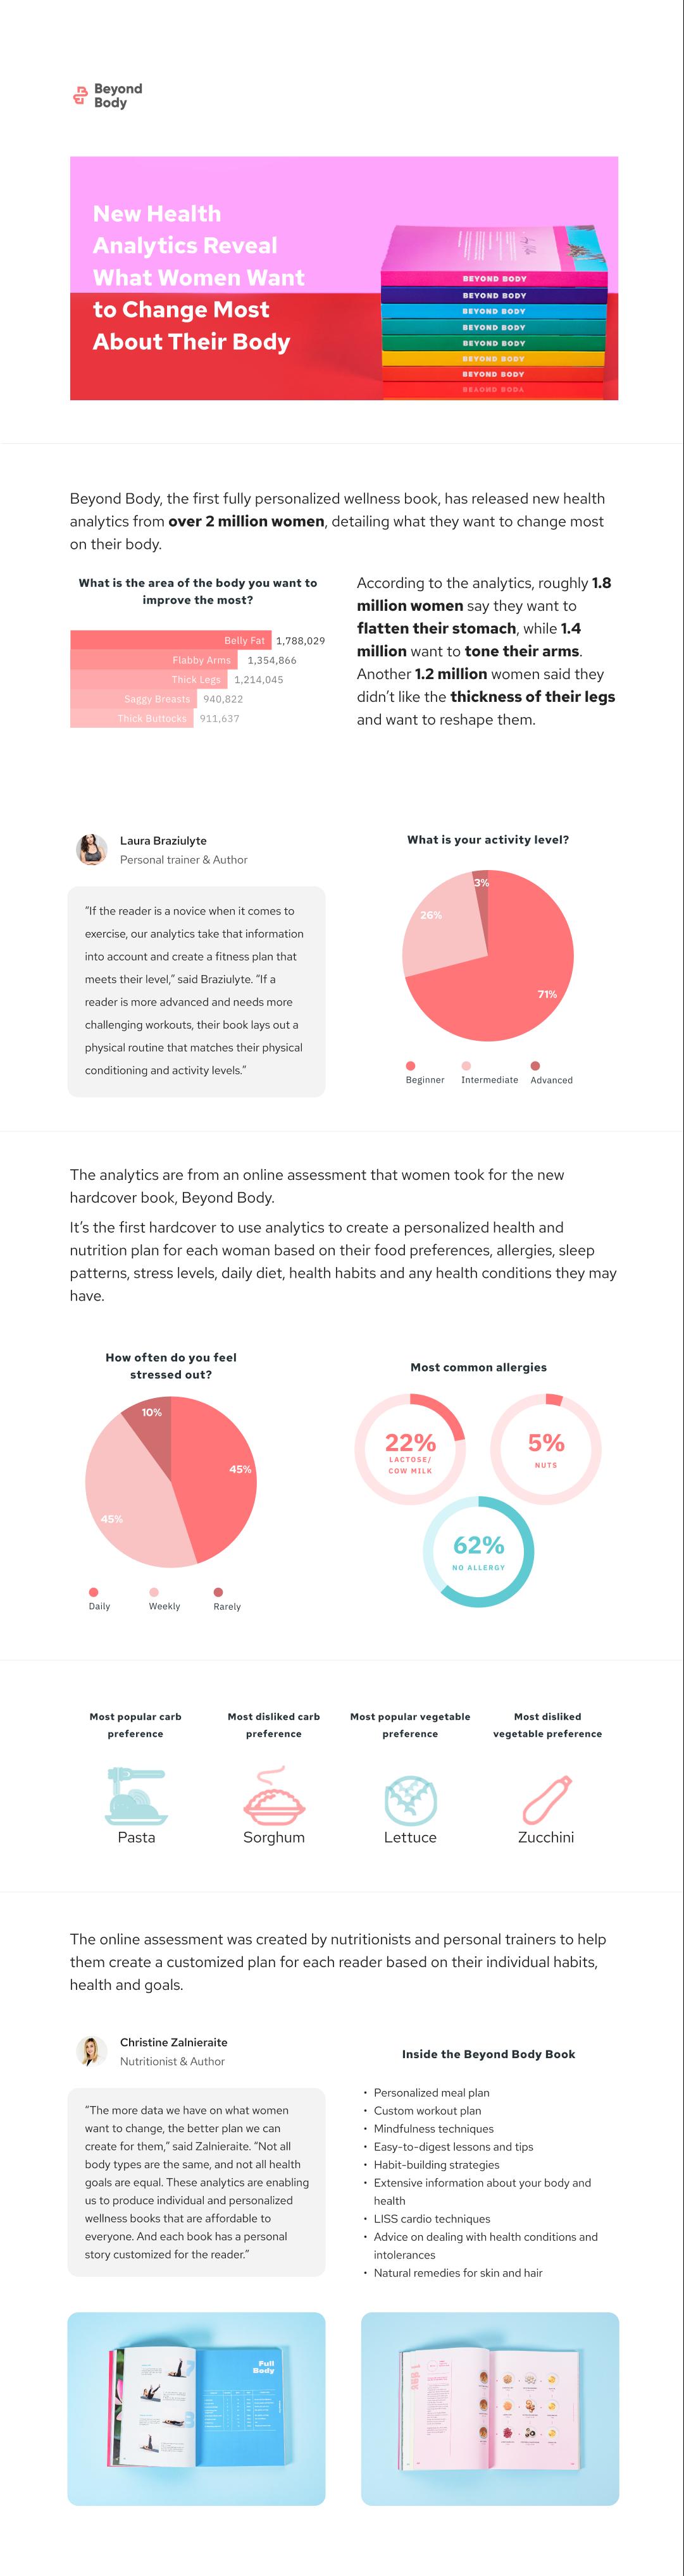 beyond-body-personalized-wellness-book-health-analytics